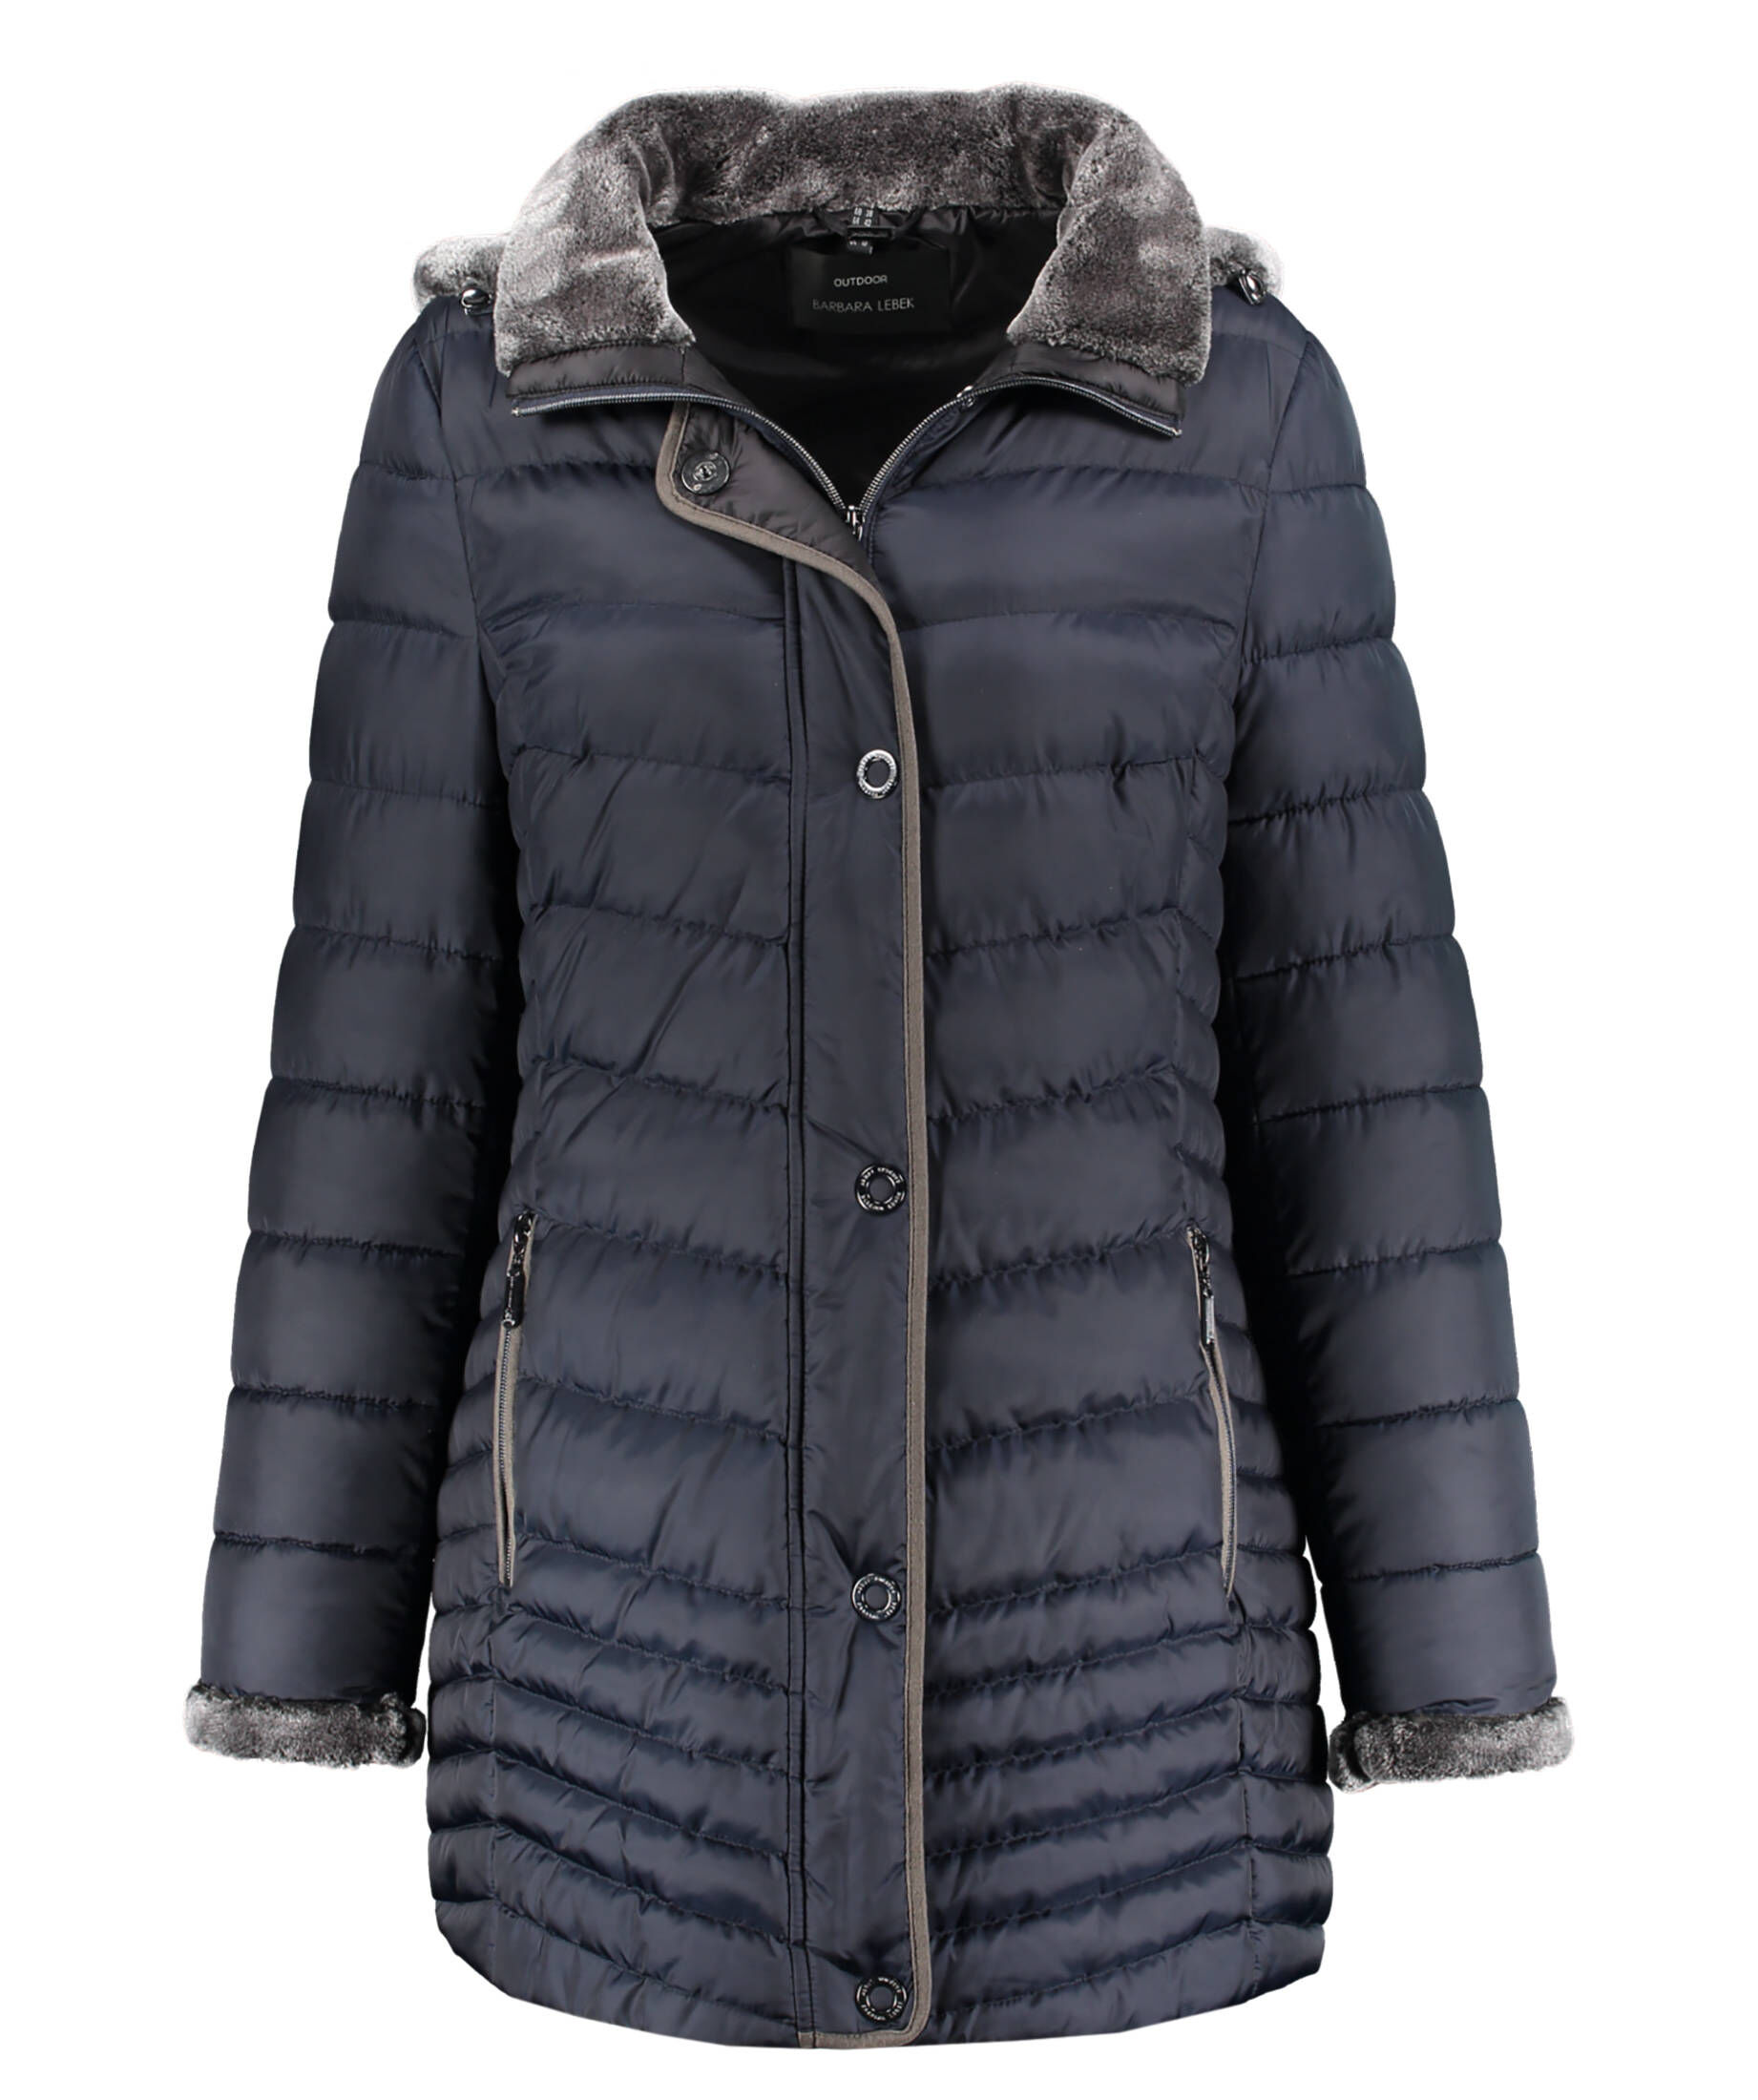 Jacken engelhorn fashion